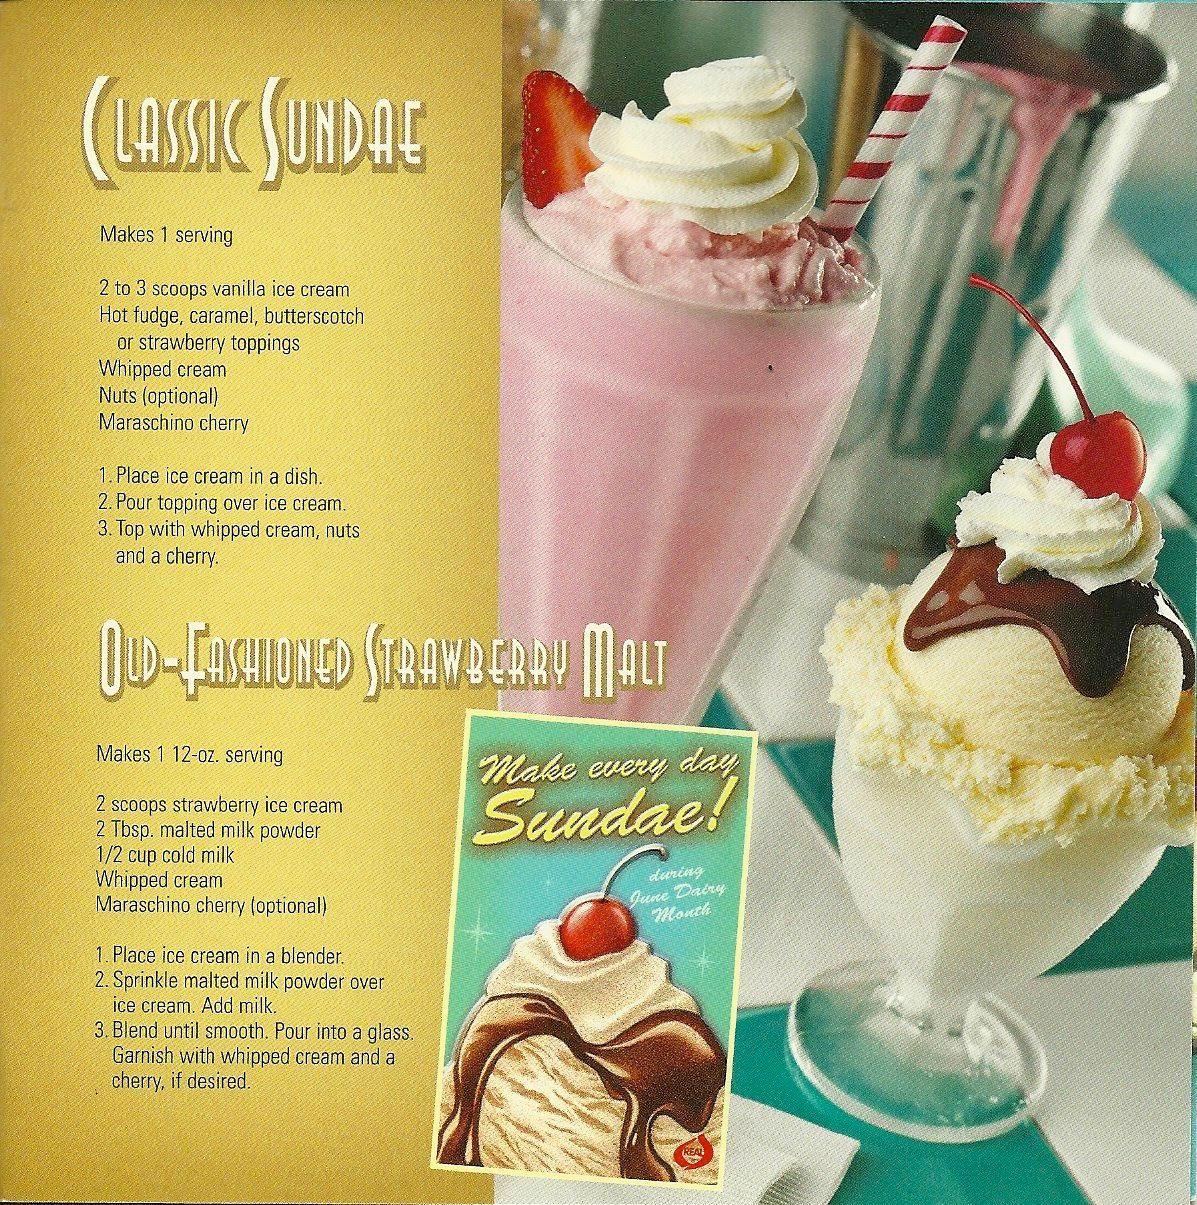 lisa bishop food stylist- classic sundae and strawberry malt